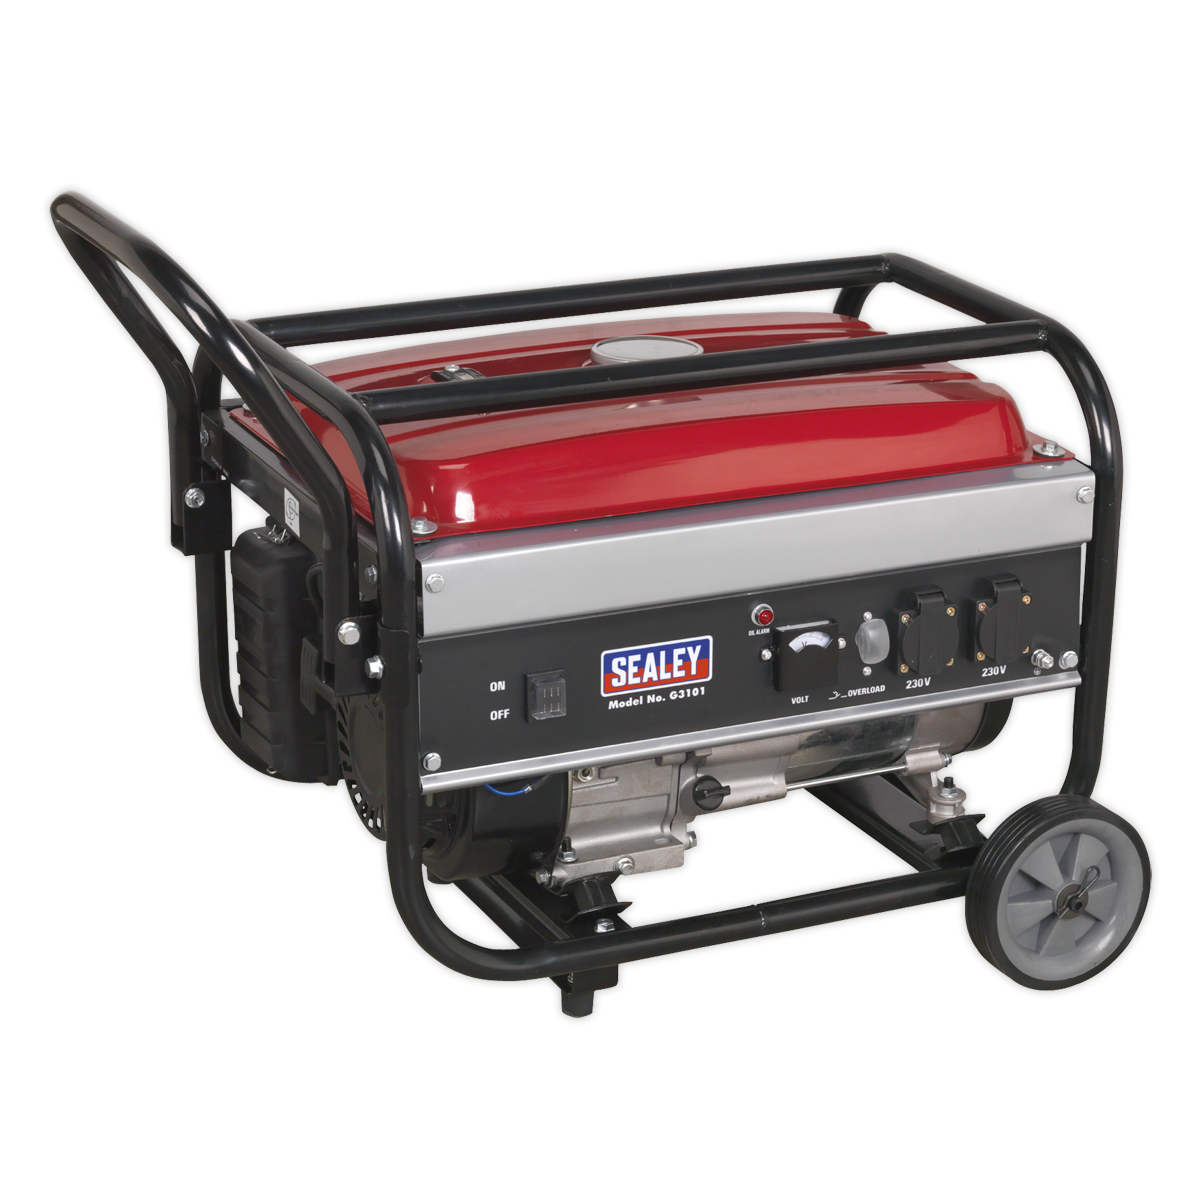 Generator 3100W 230V 7hp